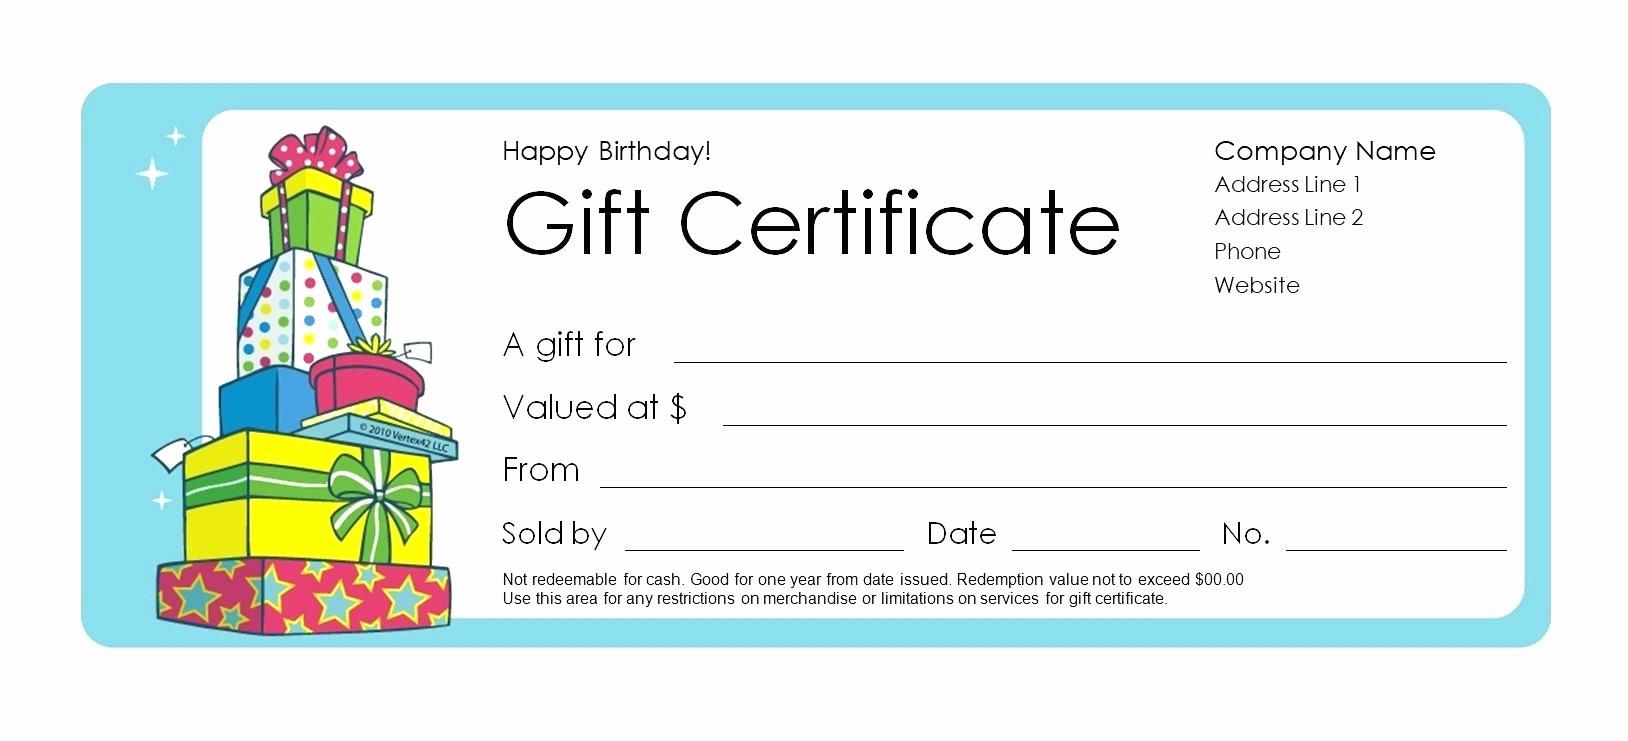 Birthday Wish List Template Printable Elegant Birthday Wish List Template Printable – Best Happy